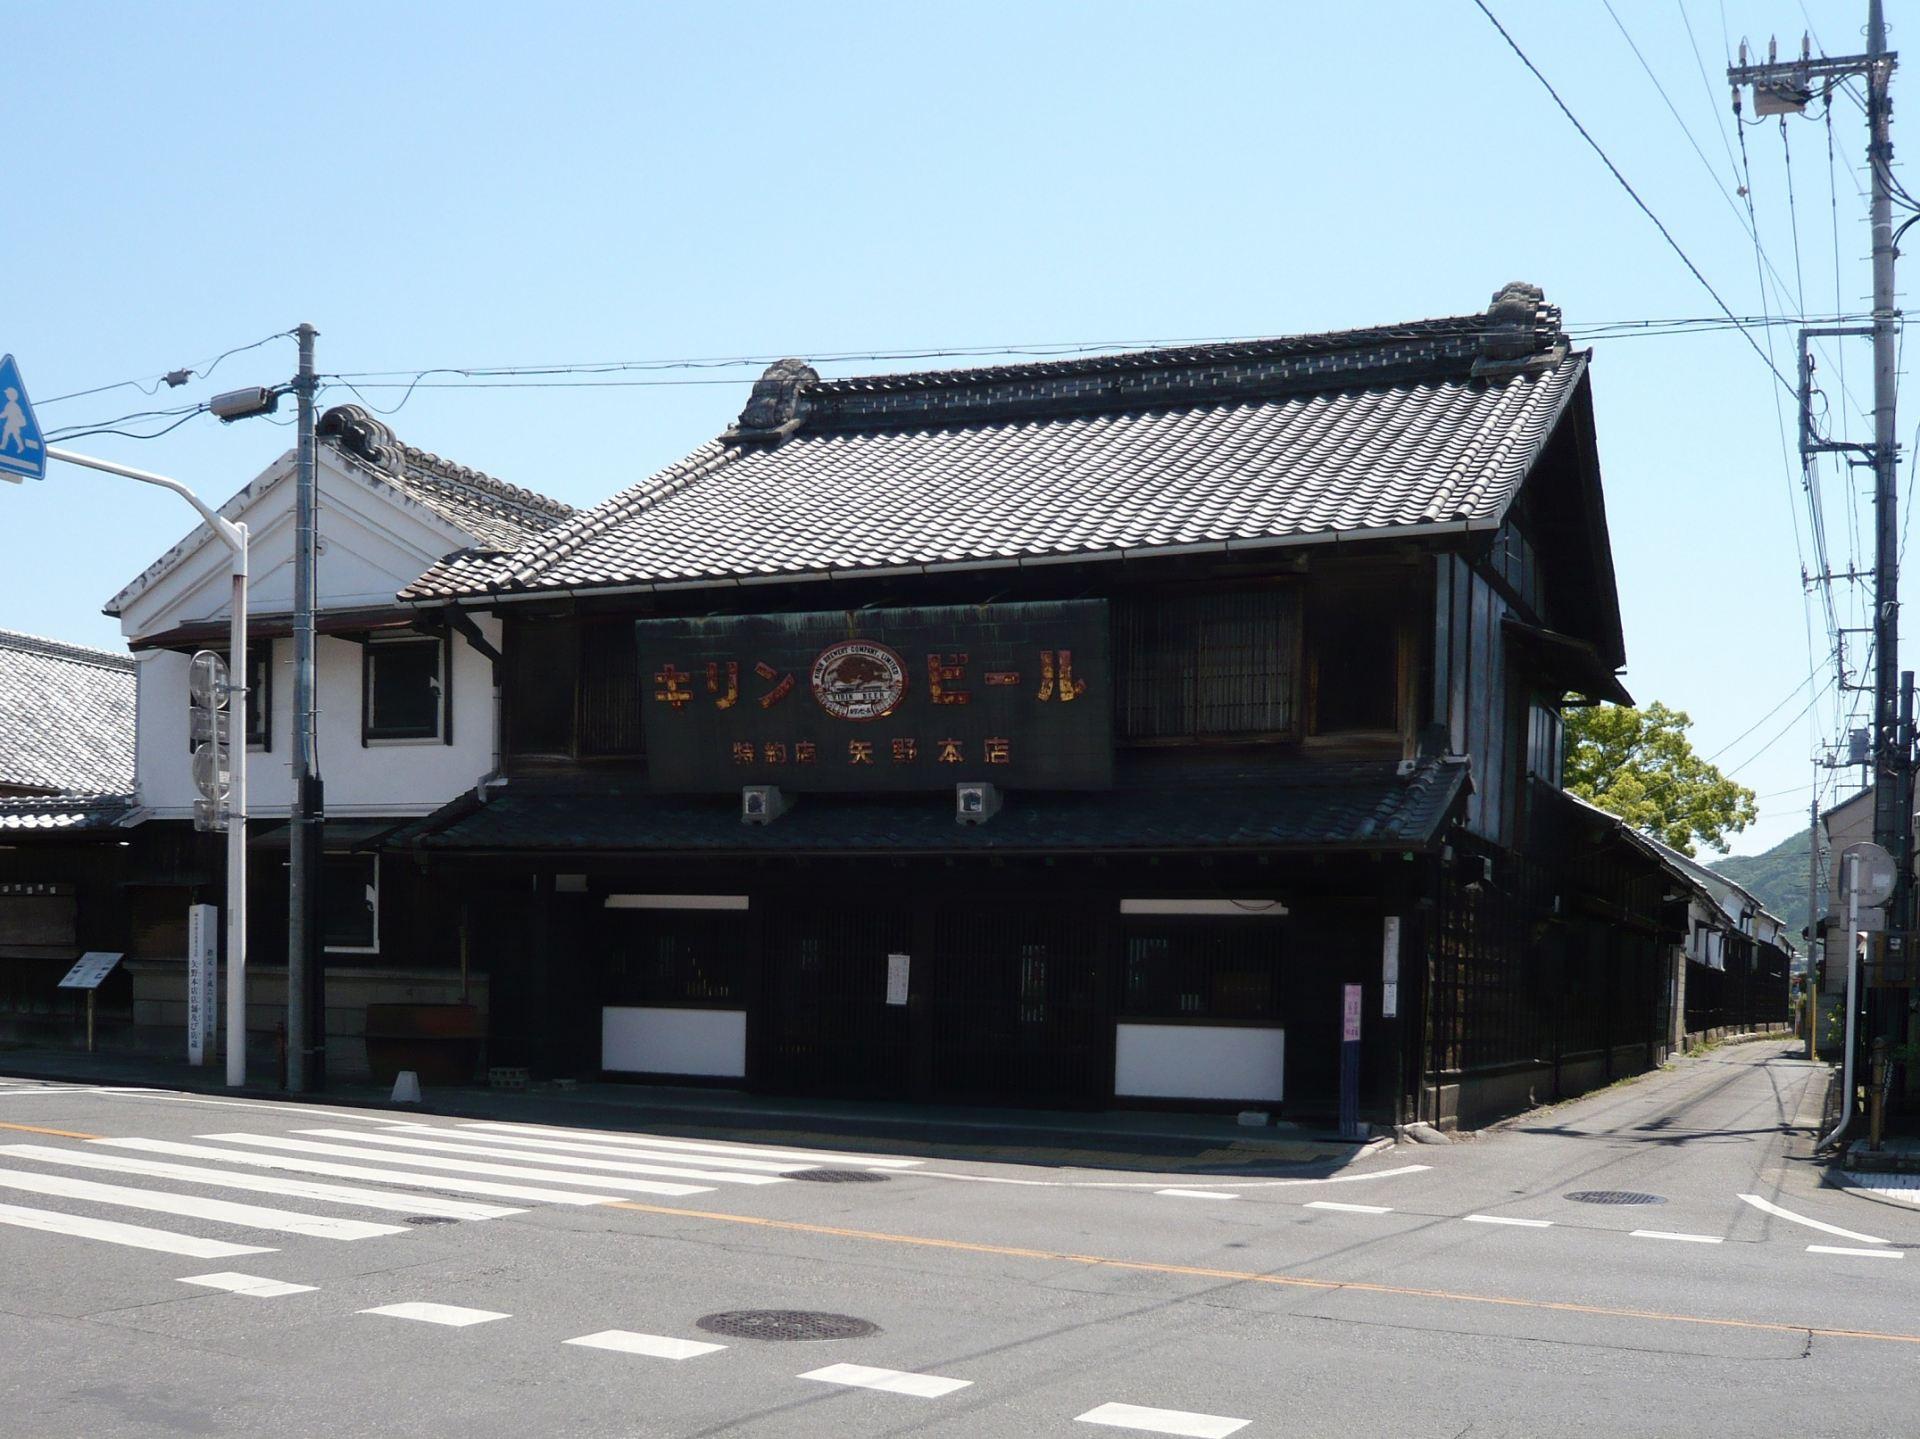 The exterior of Kiryu's Yanoen-kissayuurin, designated as an important cultural property.